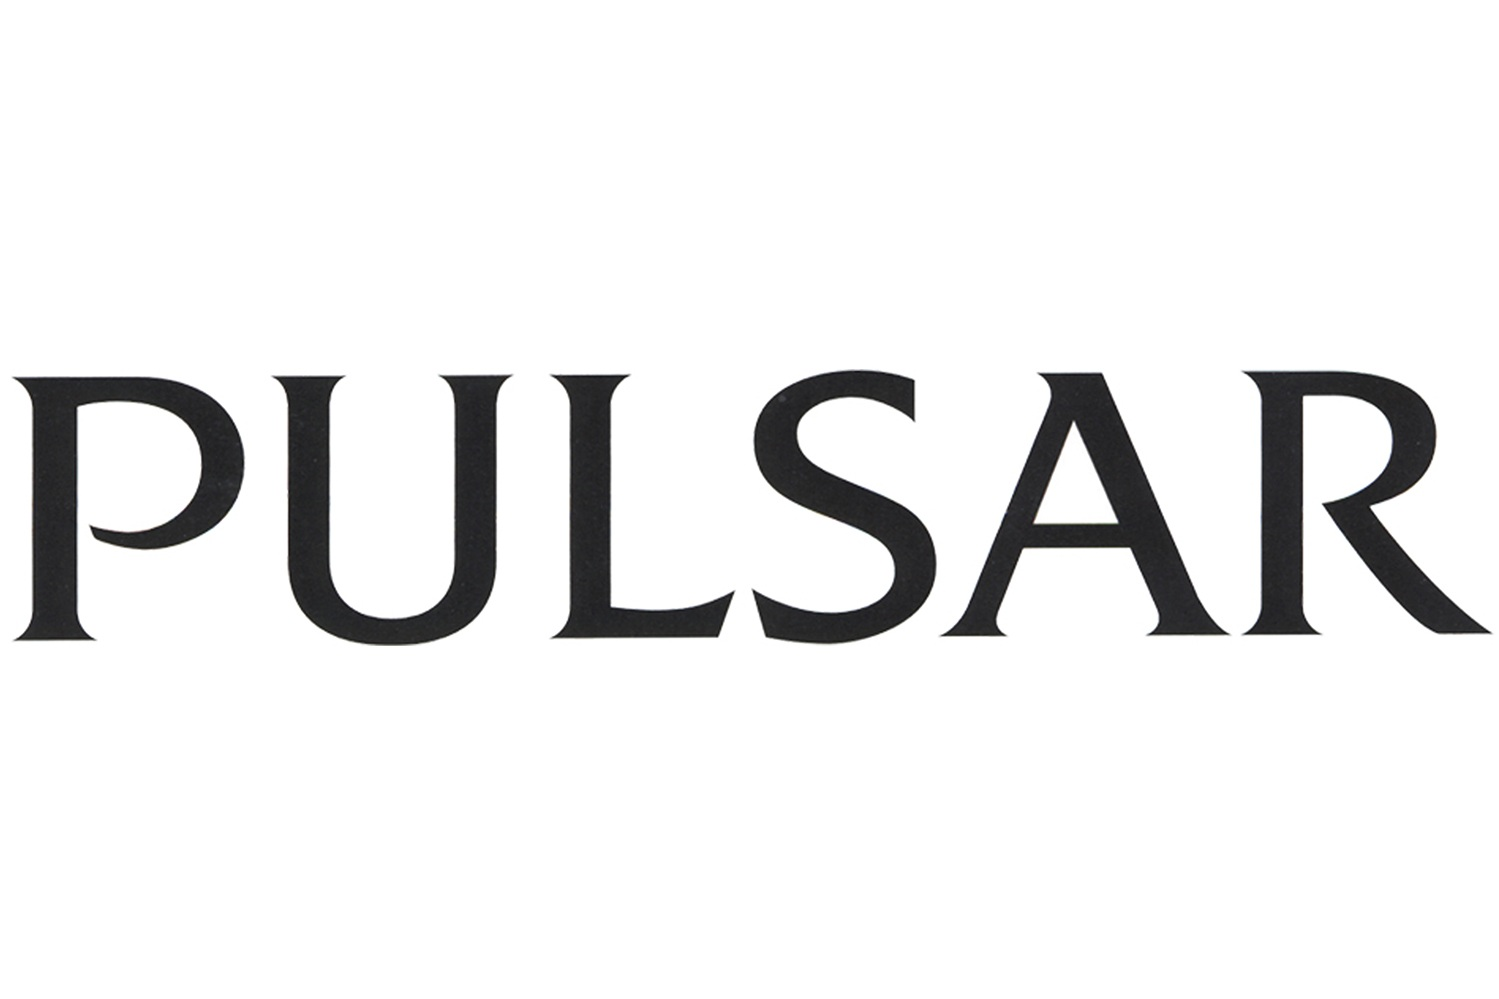 pulsar_logo_south_hills_jewelers_Pittsburgh.jpg